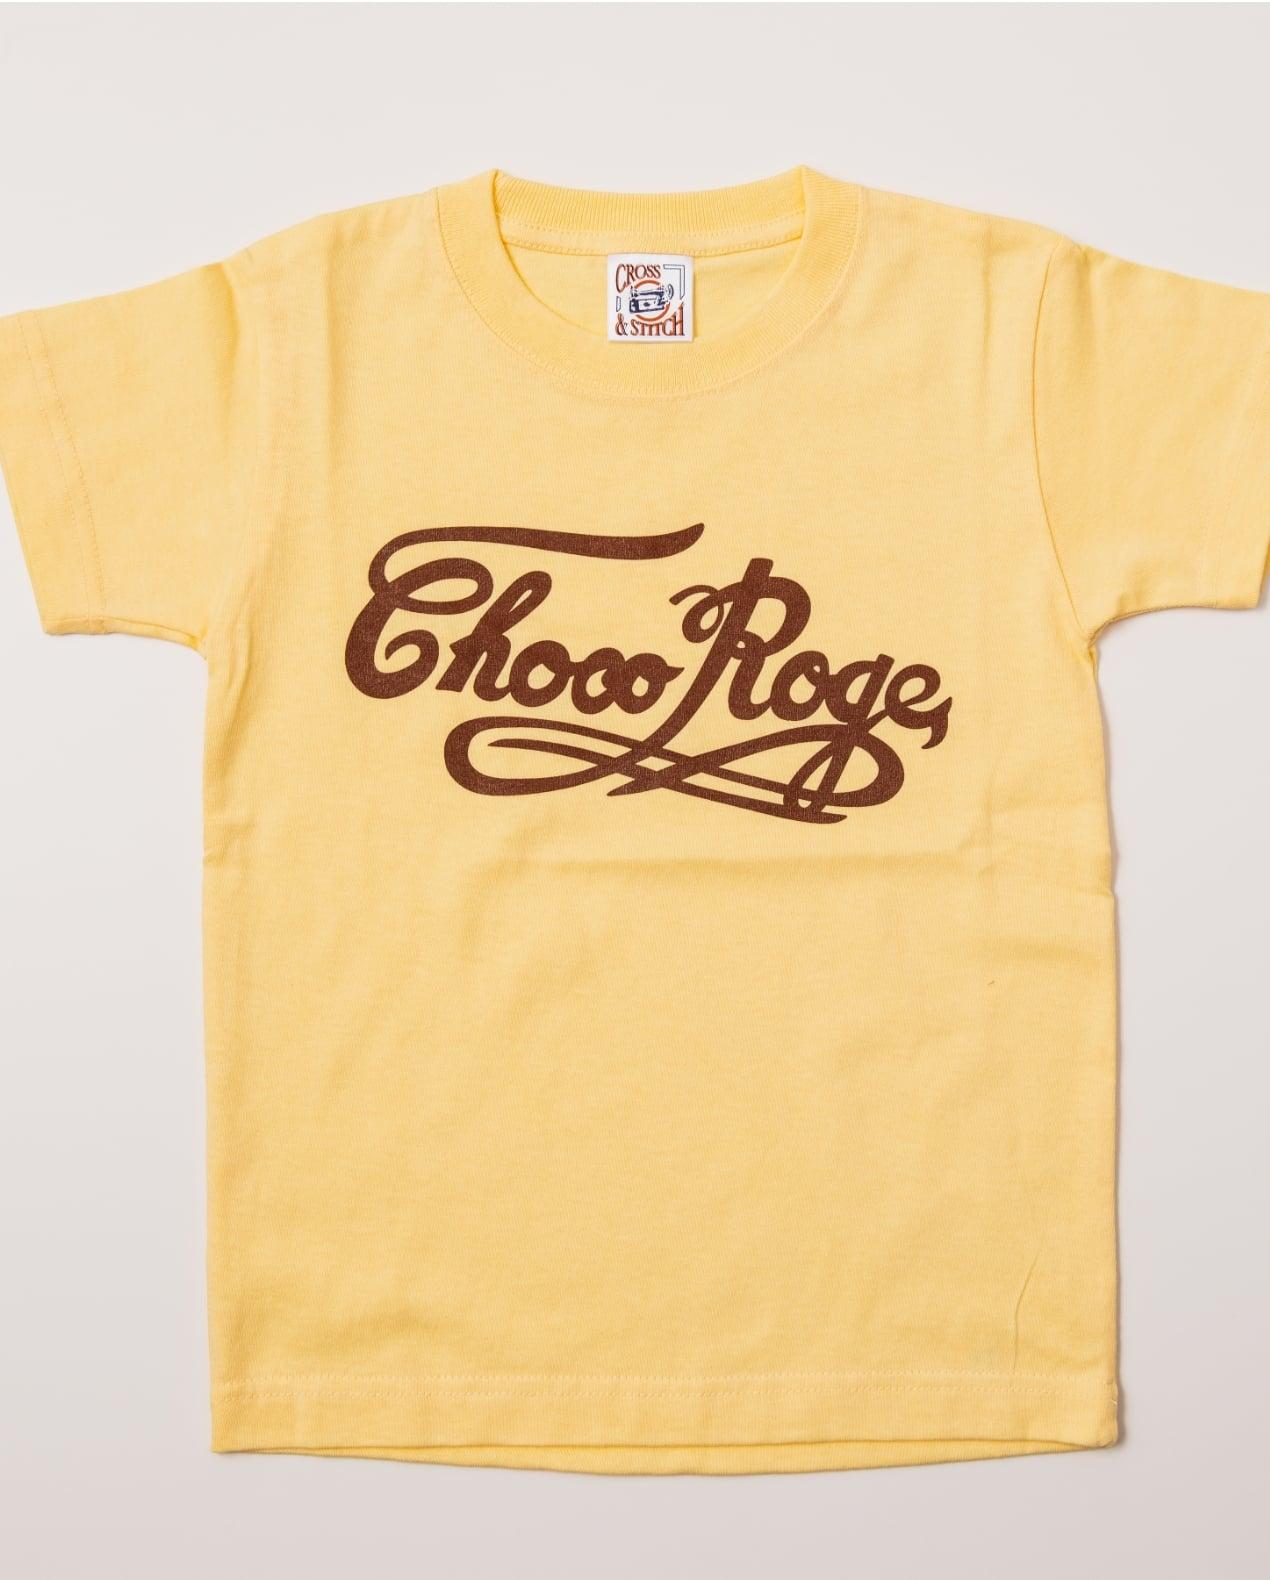 Tシャツ 大人用 黄色 サイズS